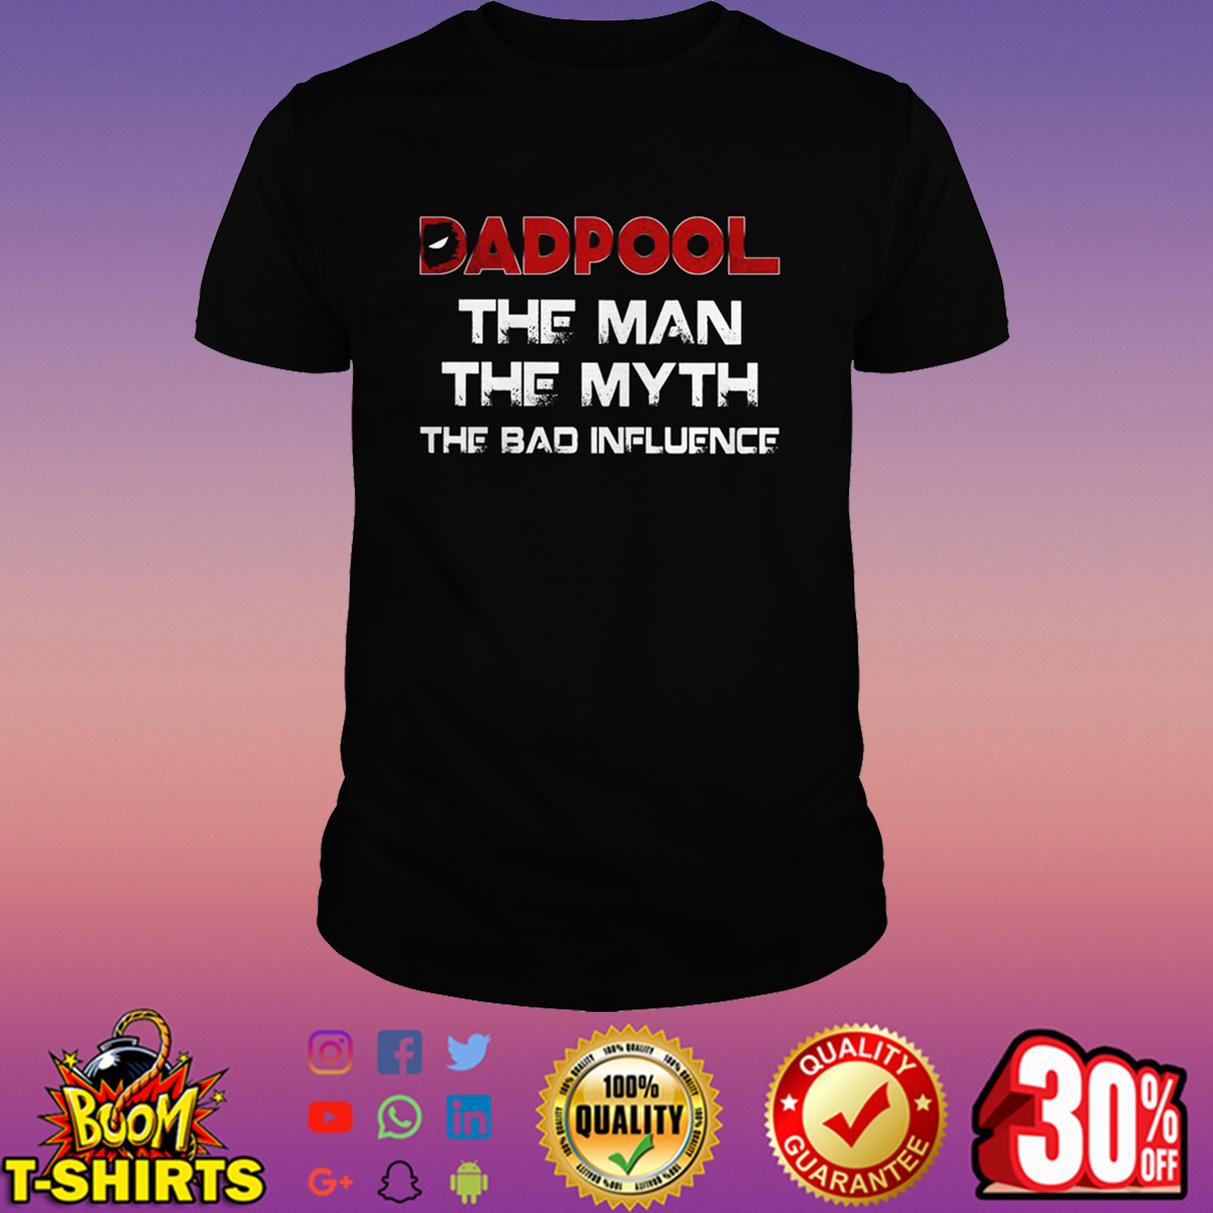 Dadpool the man the myth the bad influence shirt